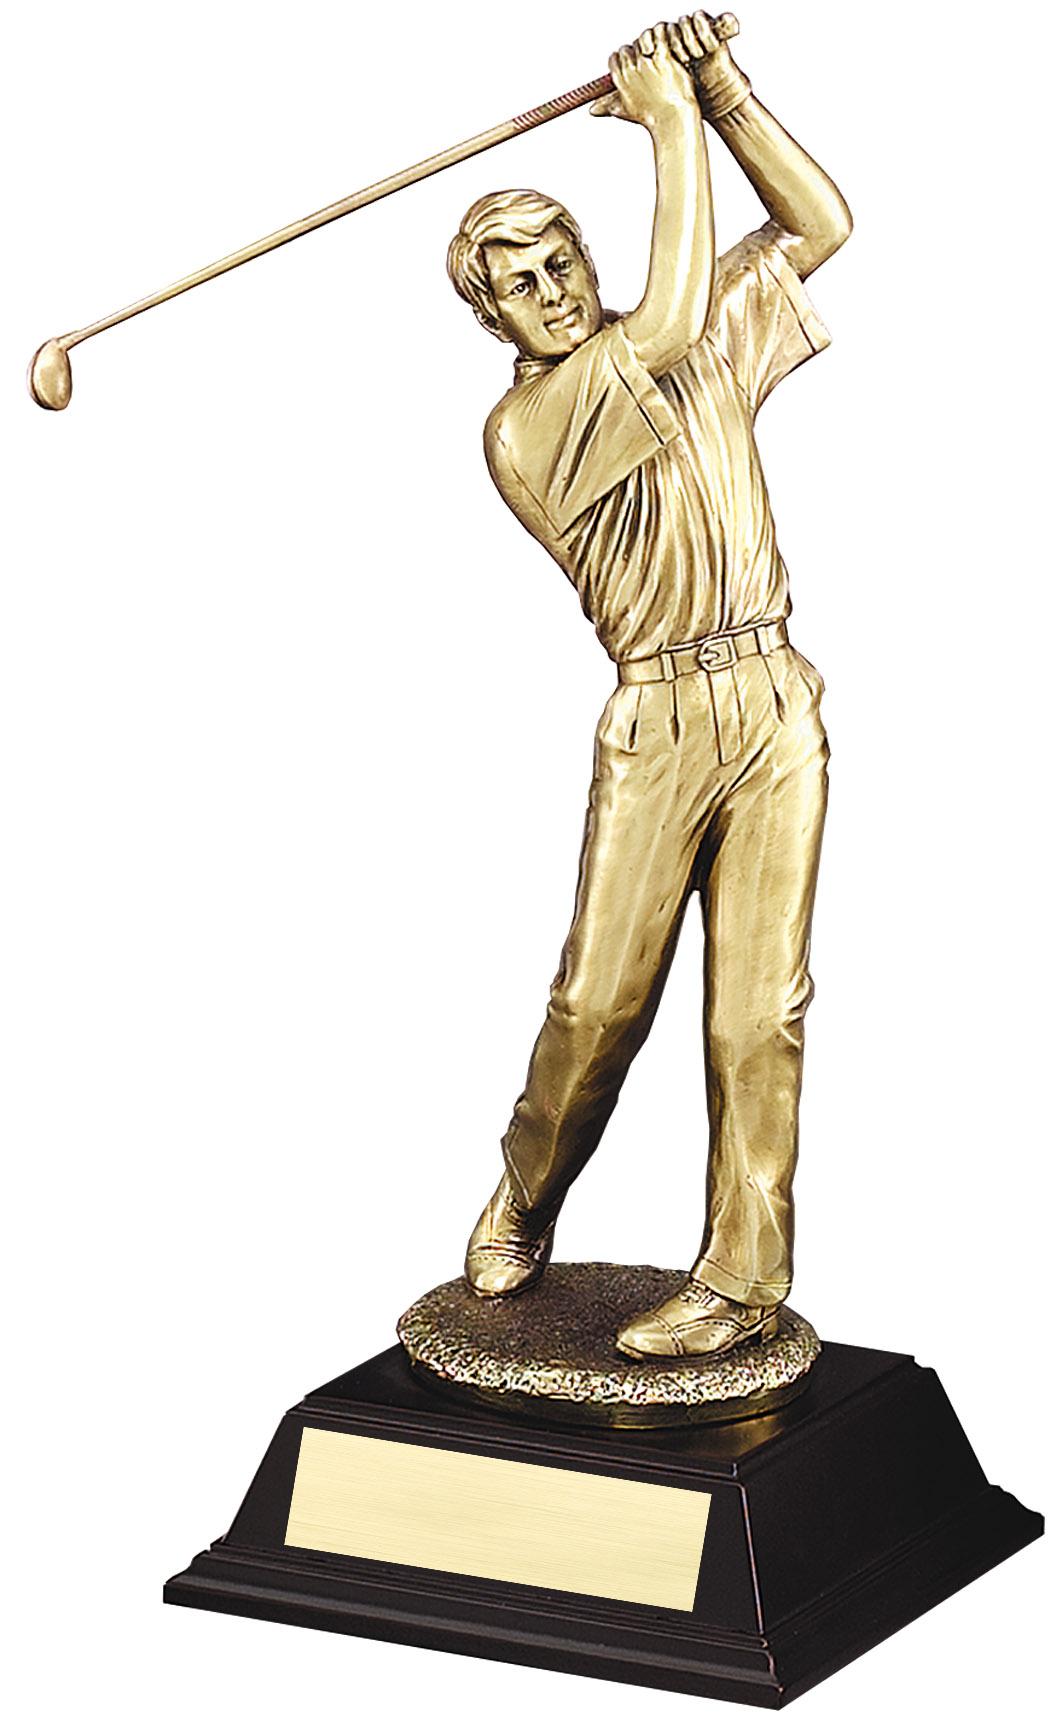 "Elegant Gold Metallic Resin -Swing, Male    Medium:  G2702 - 13"" tall -  $83    Small:  G2701 - 10"" tall -  $48"